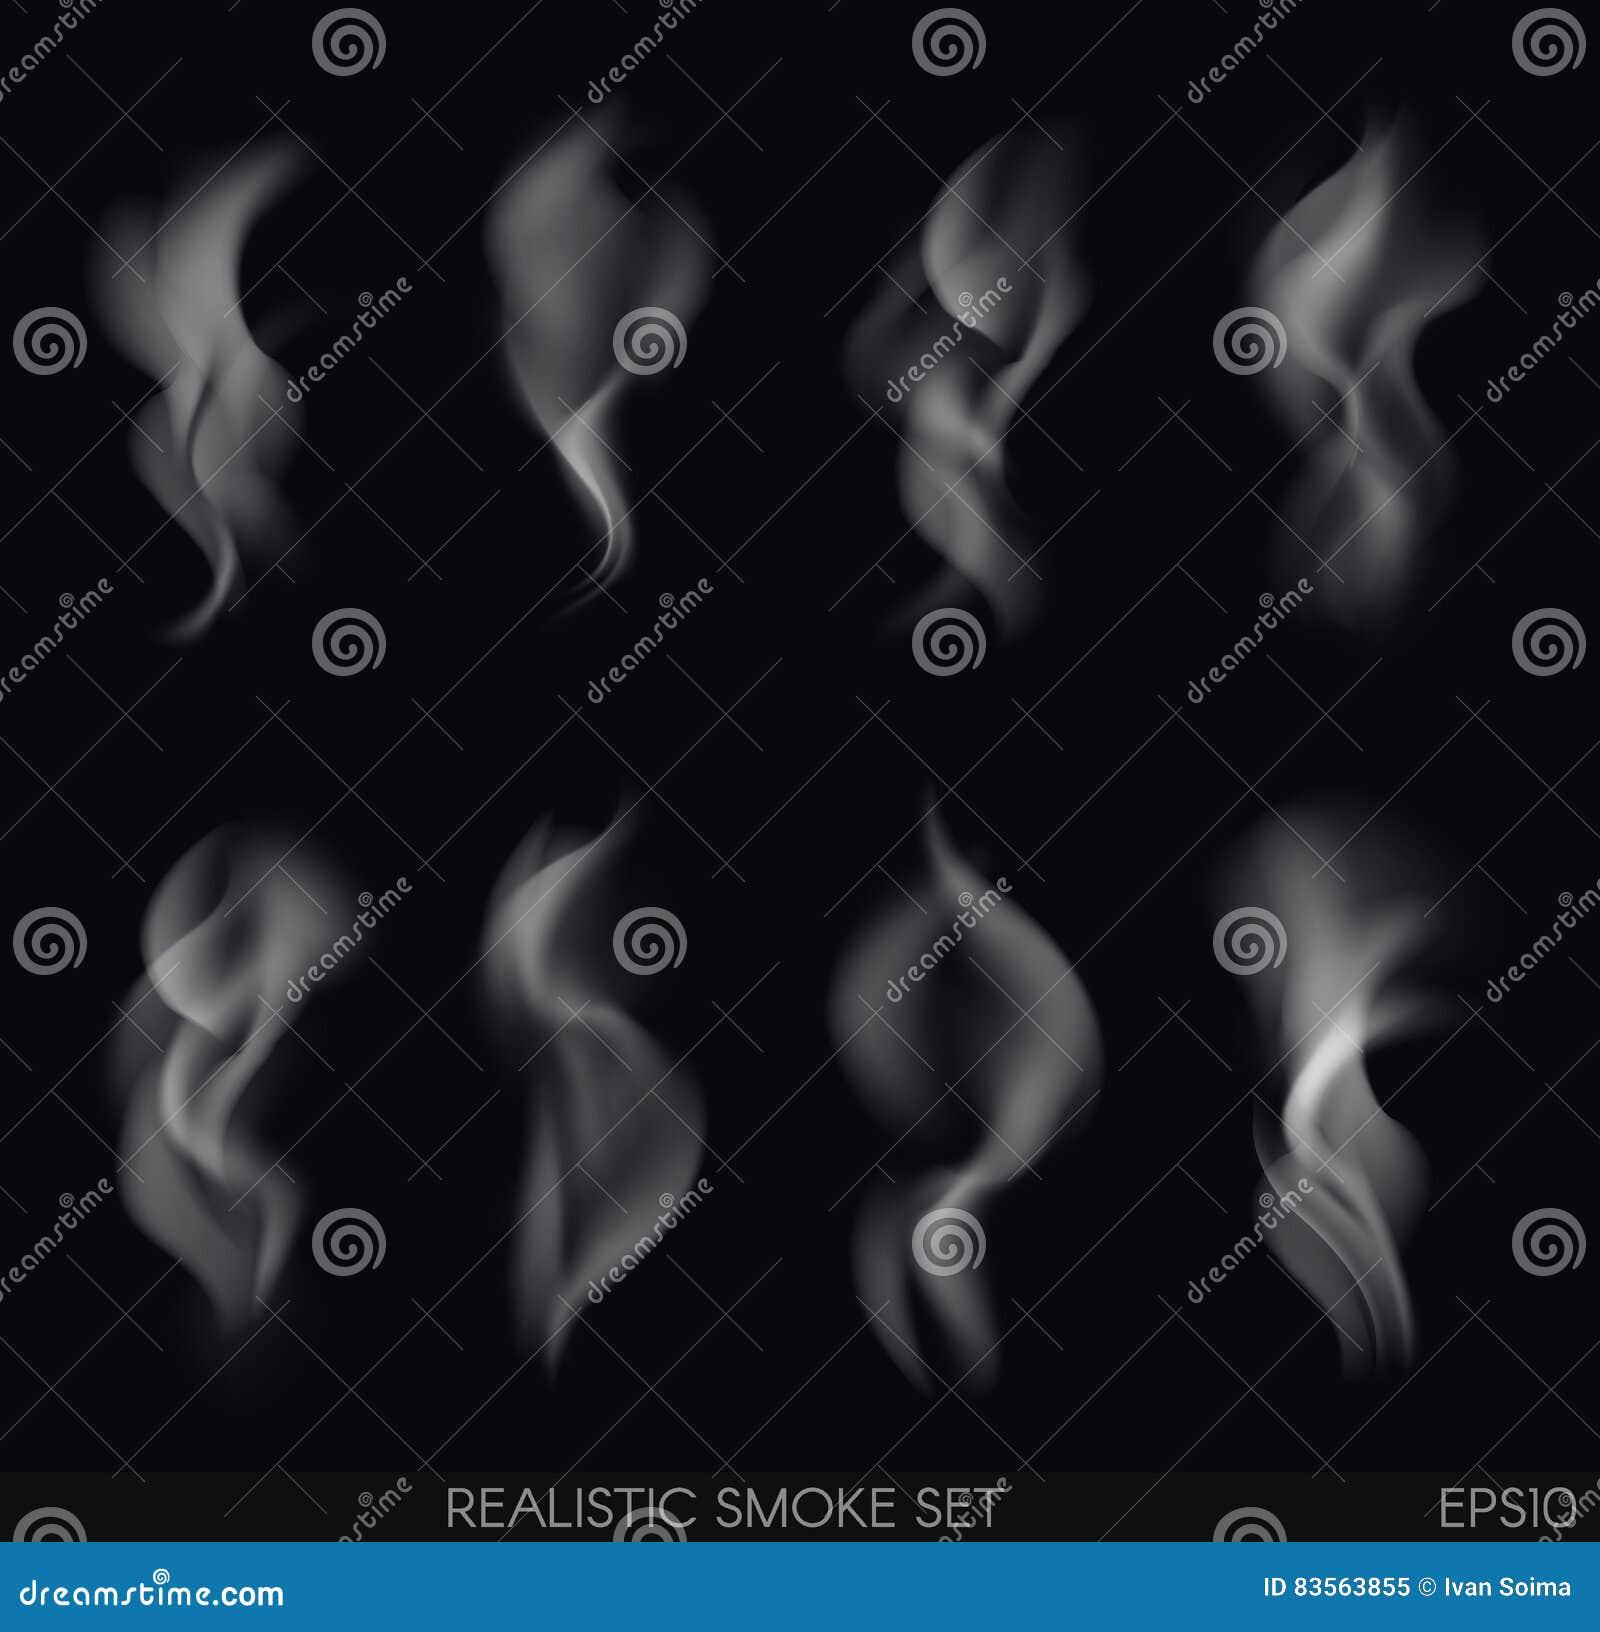 Realistic smoke set stock vector  Illustration of concept